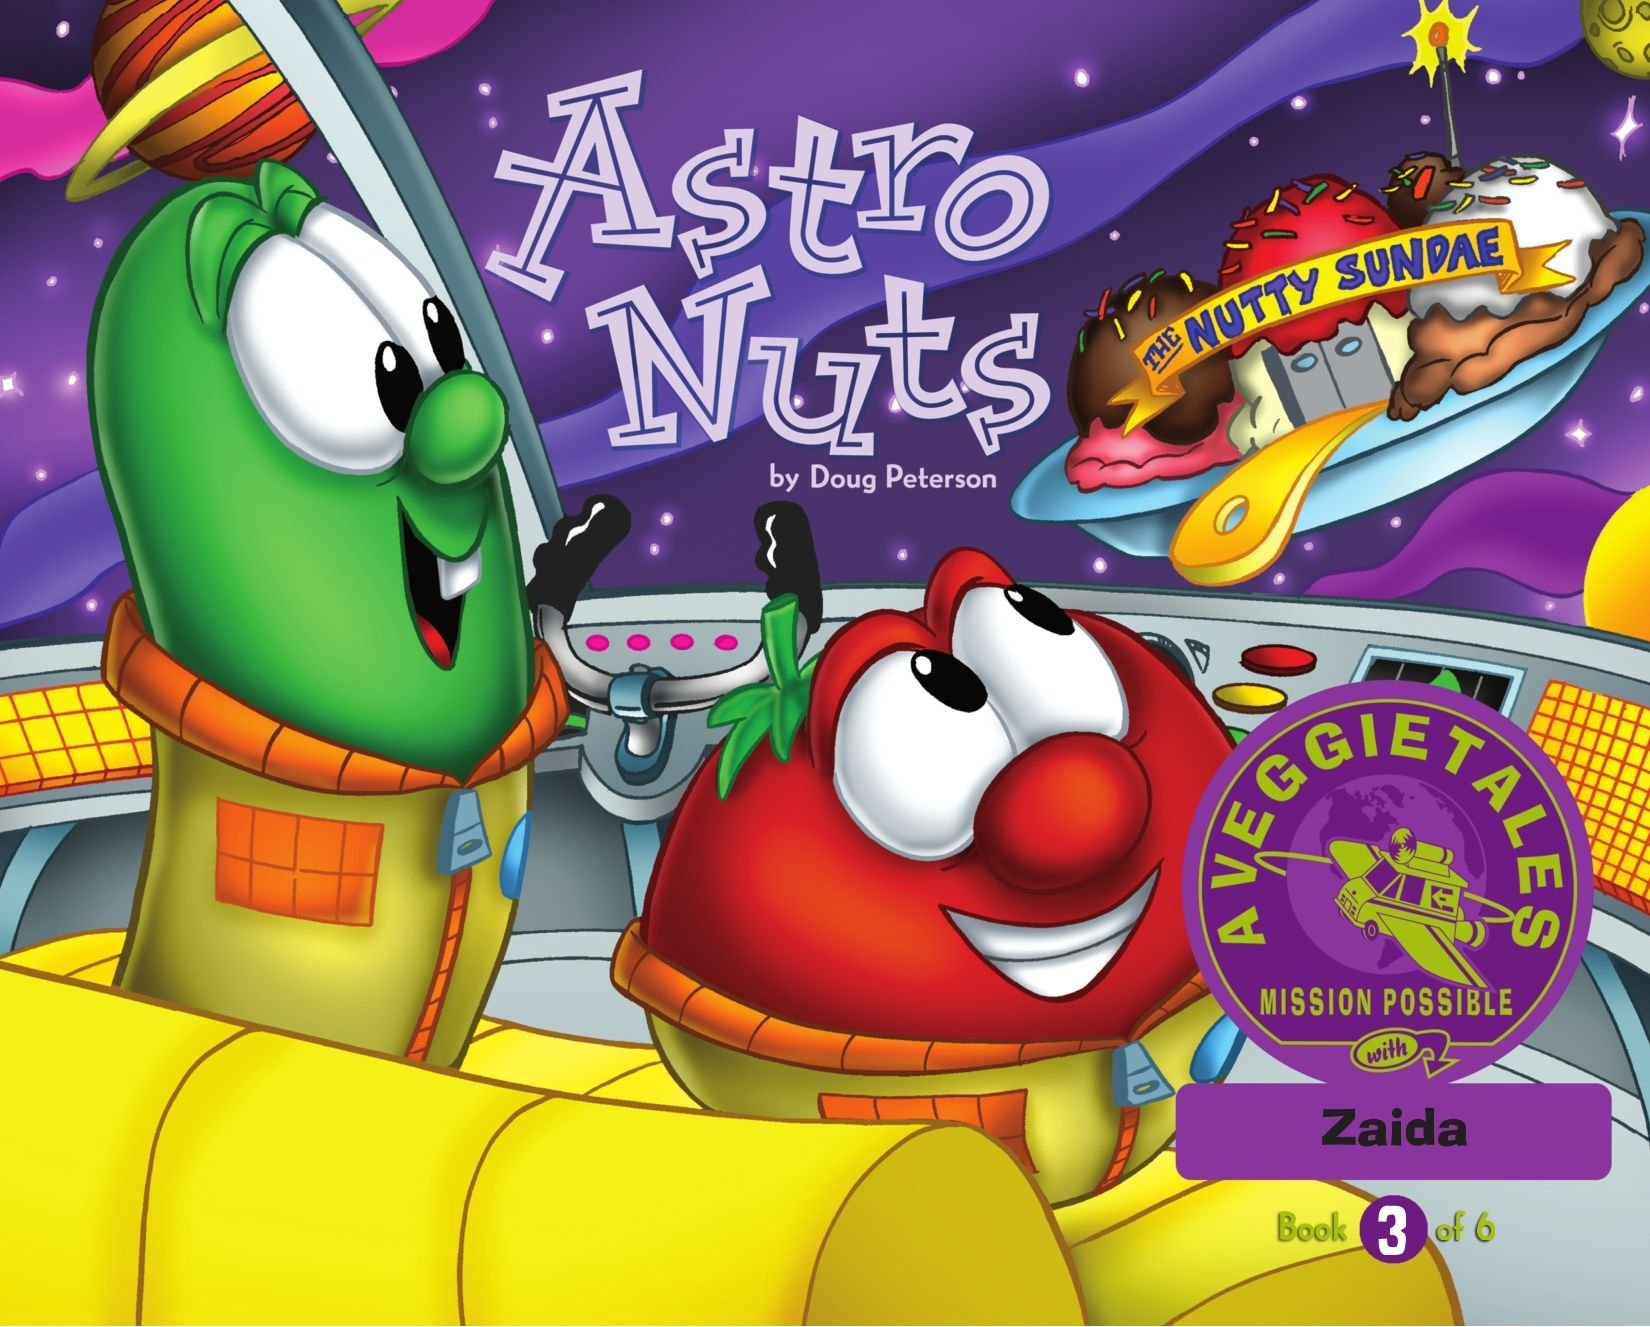 Astro Nuts - VeggieTales Mission Possible Adventure Series #3: Personalized for Zaida (Boy) PDF